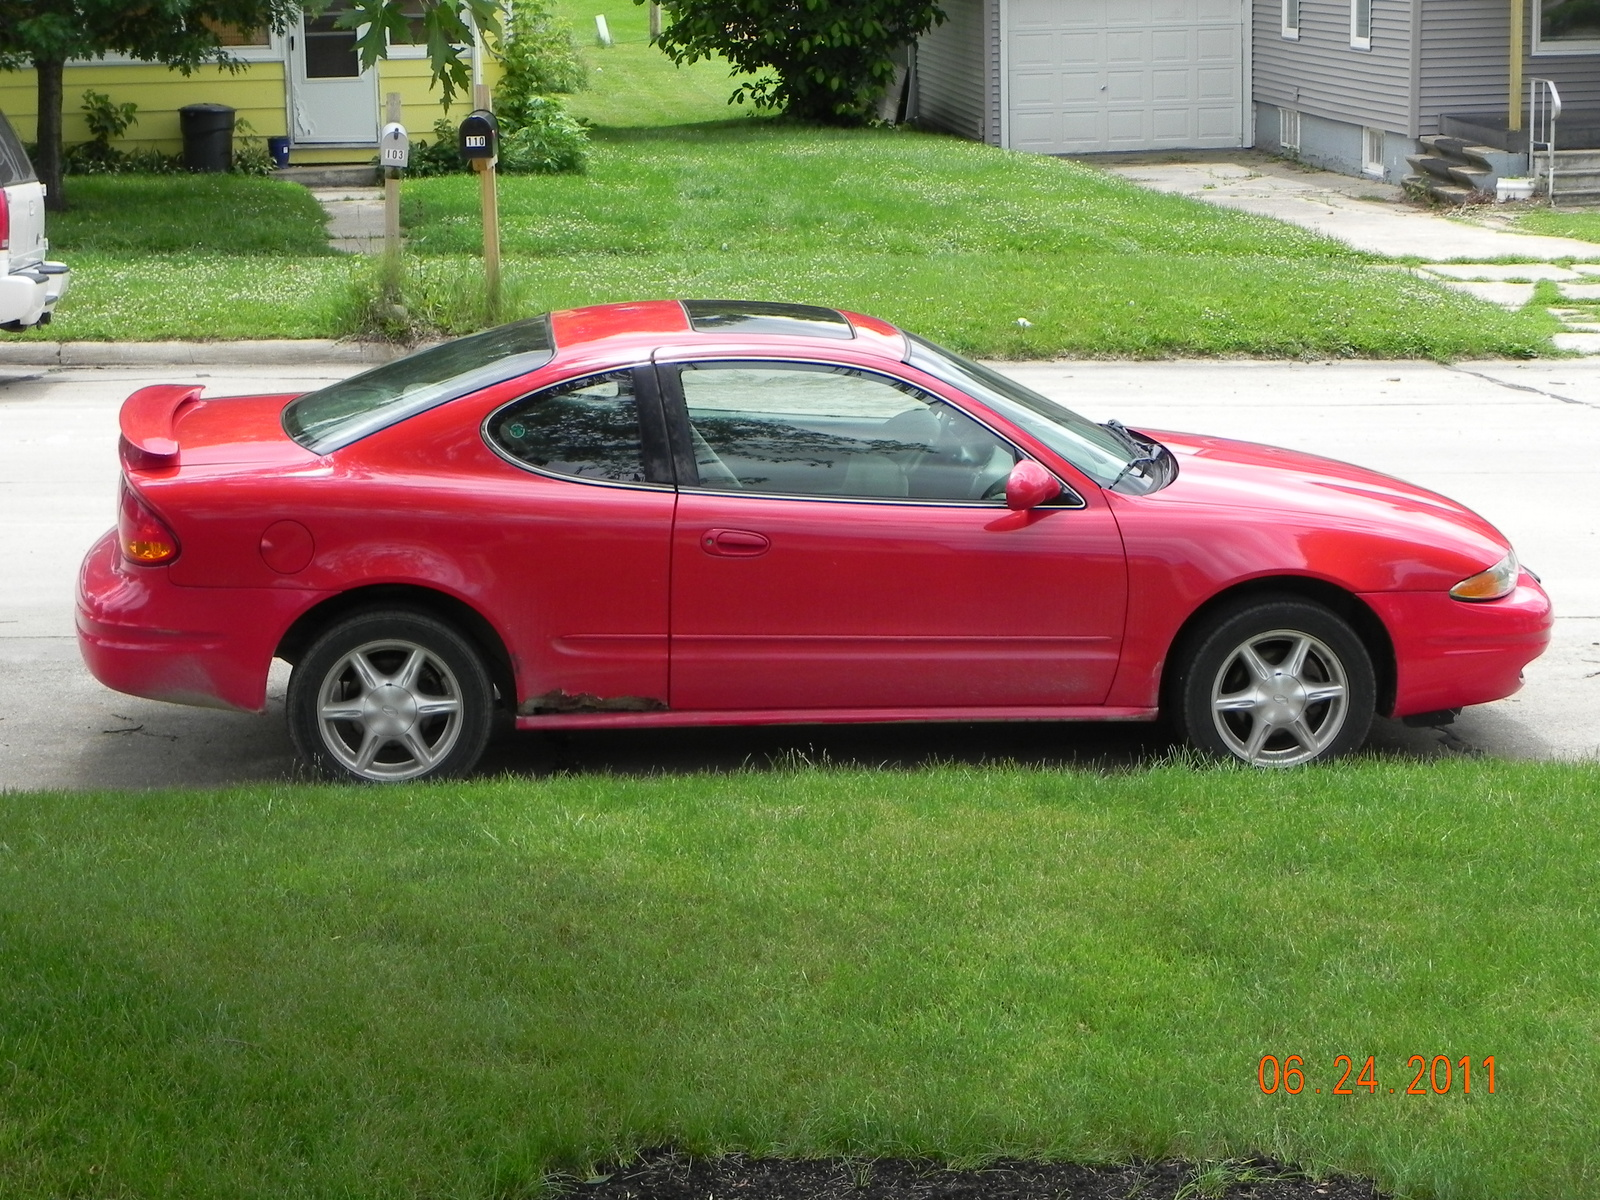 2004 Oldsmobile Alero Problems